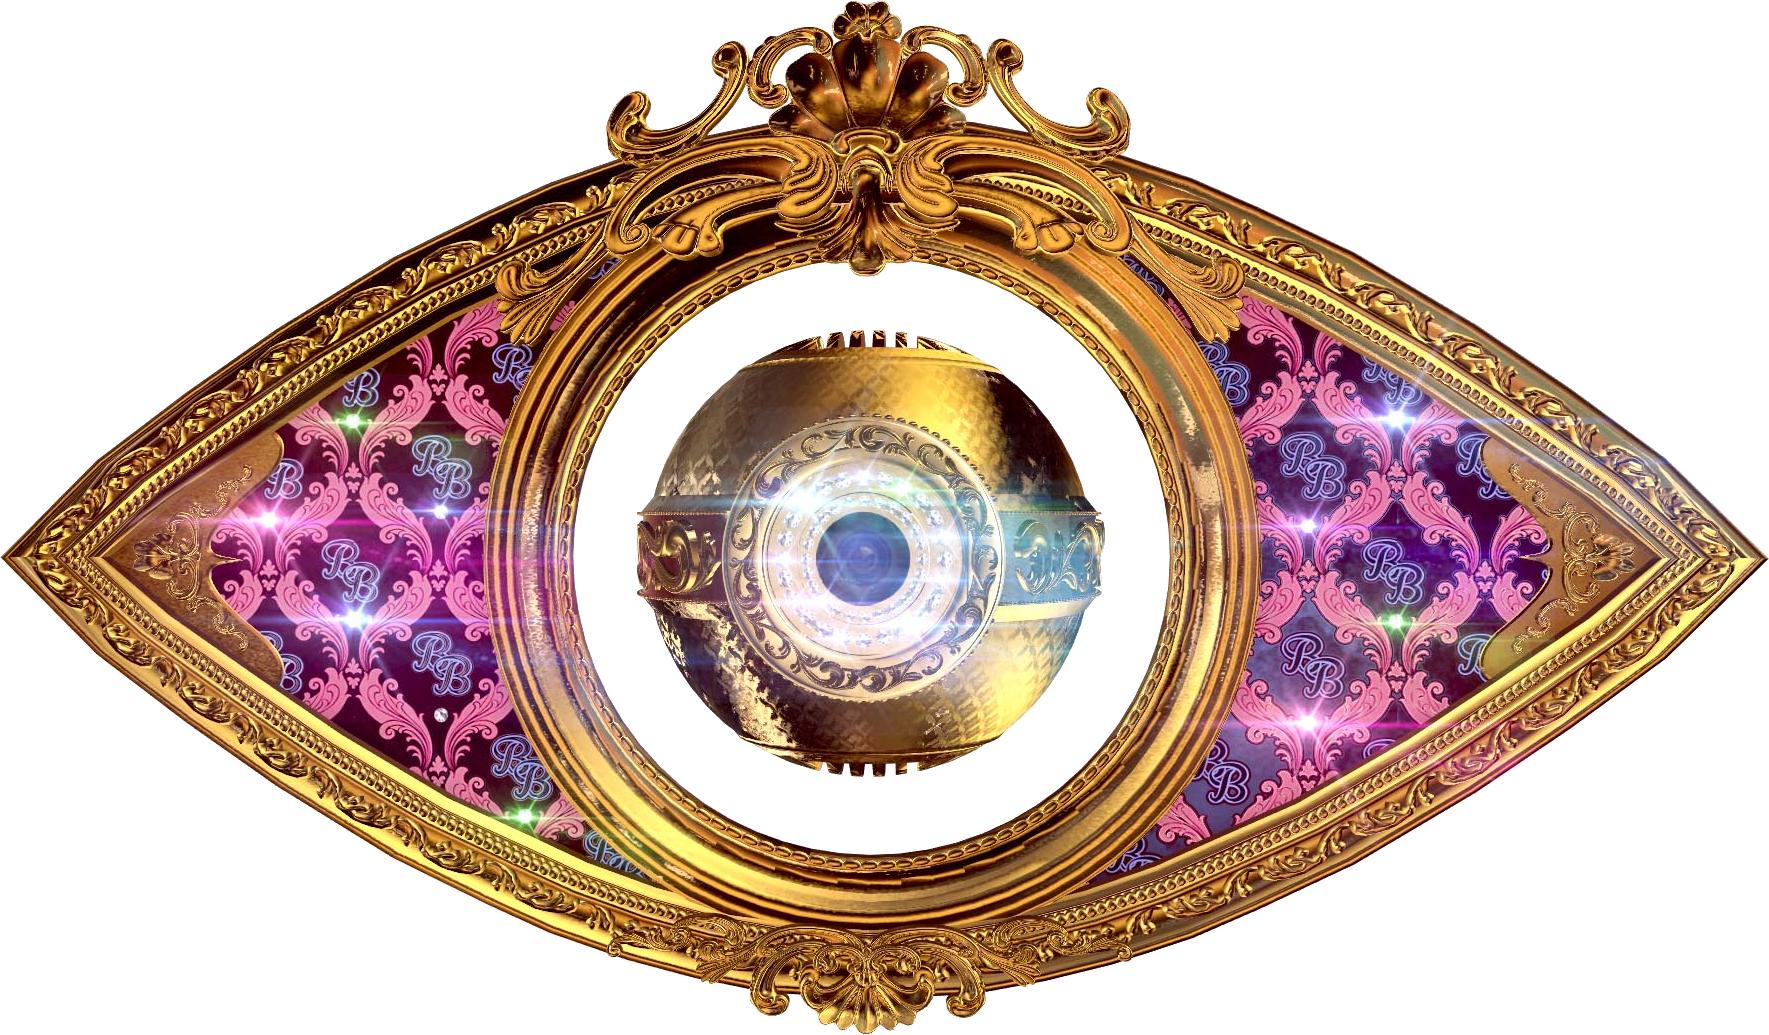 Cast Astrology Signs : BigBrother - reddit